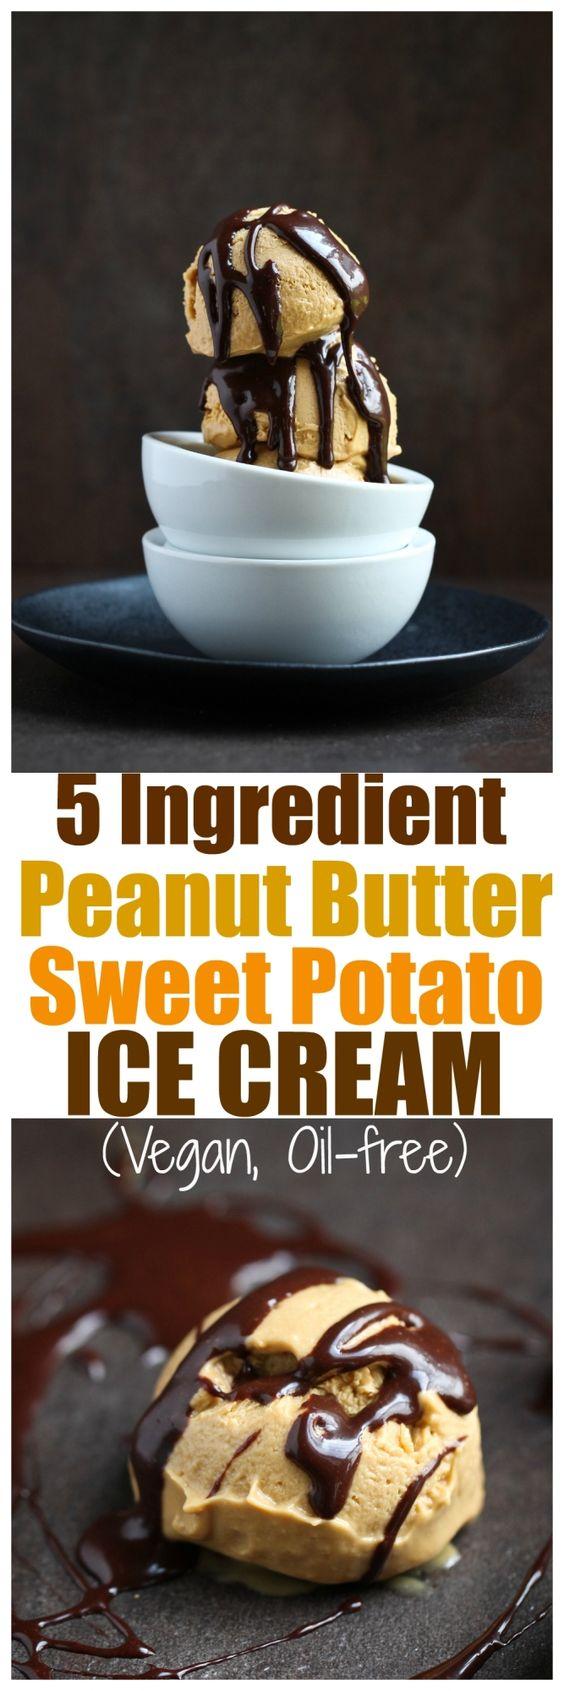 5 Ingredient Vegan Peanut Butter Sweet Potato Ice Cream. Vegan, dairy-free, oil-free, gluten-free peanut butter ice cream made with sweet potatoes & coconut